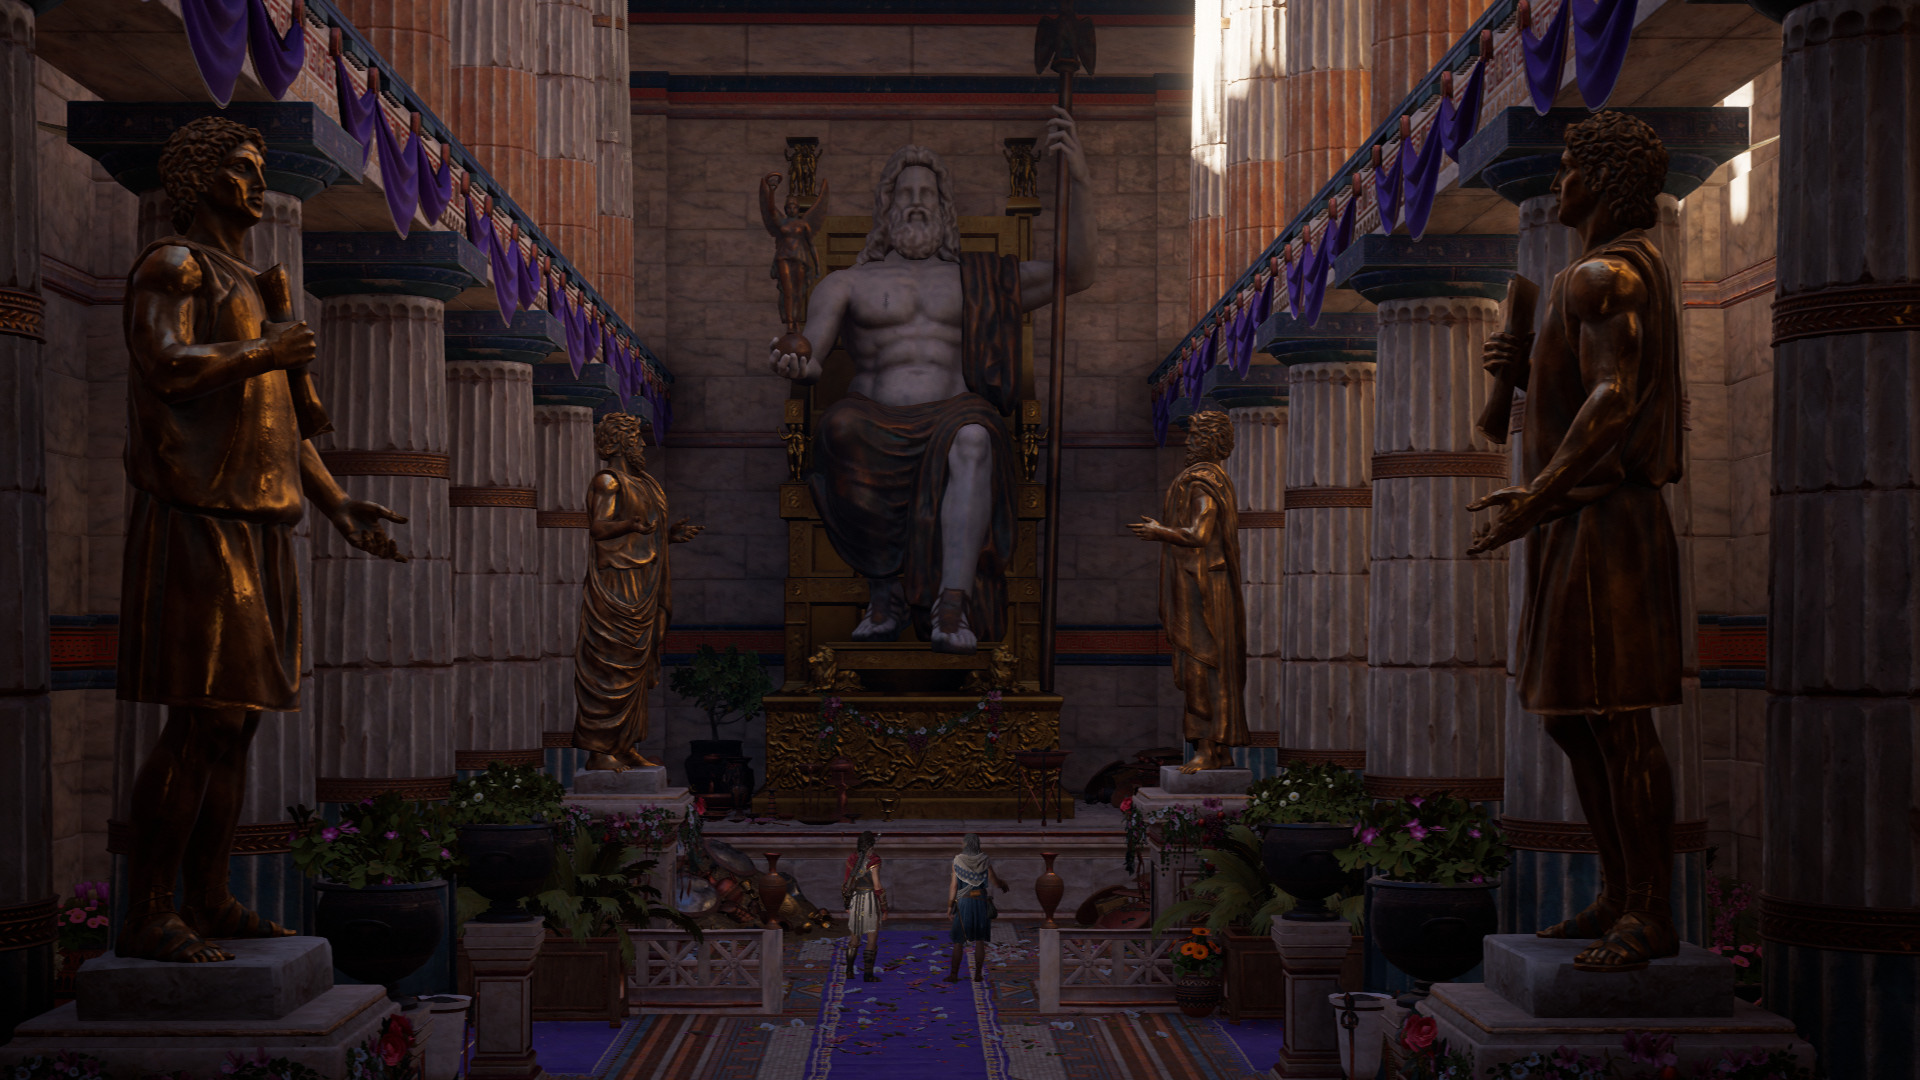 Statue of Zeus Olympia Assassins Creed Wiki FANDOM powered 1920x1080